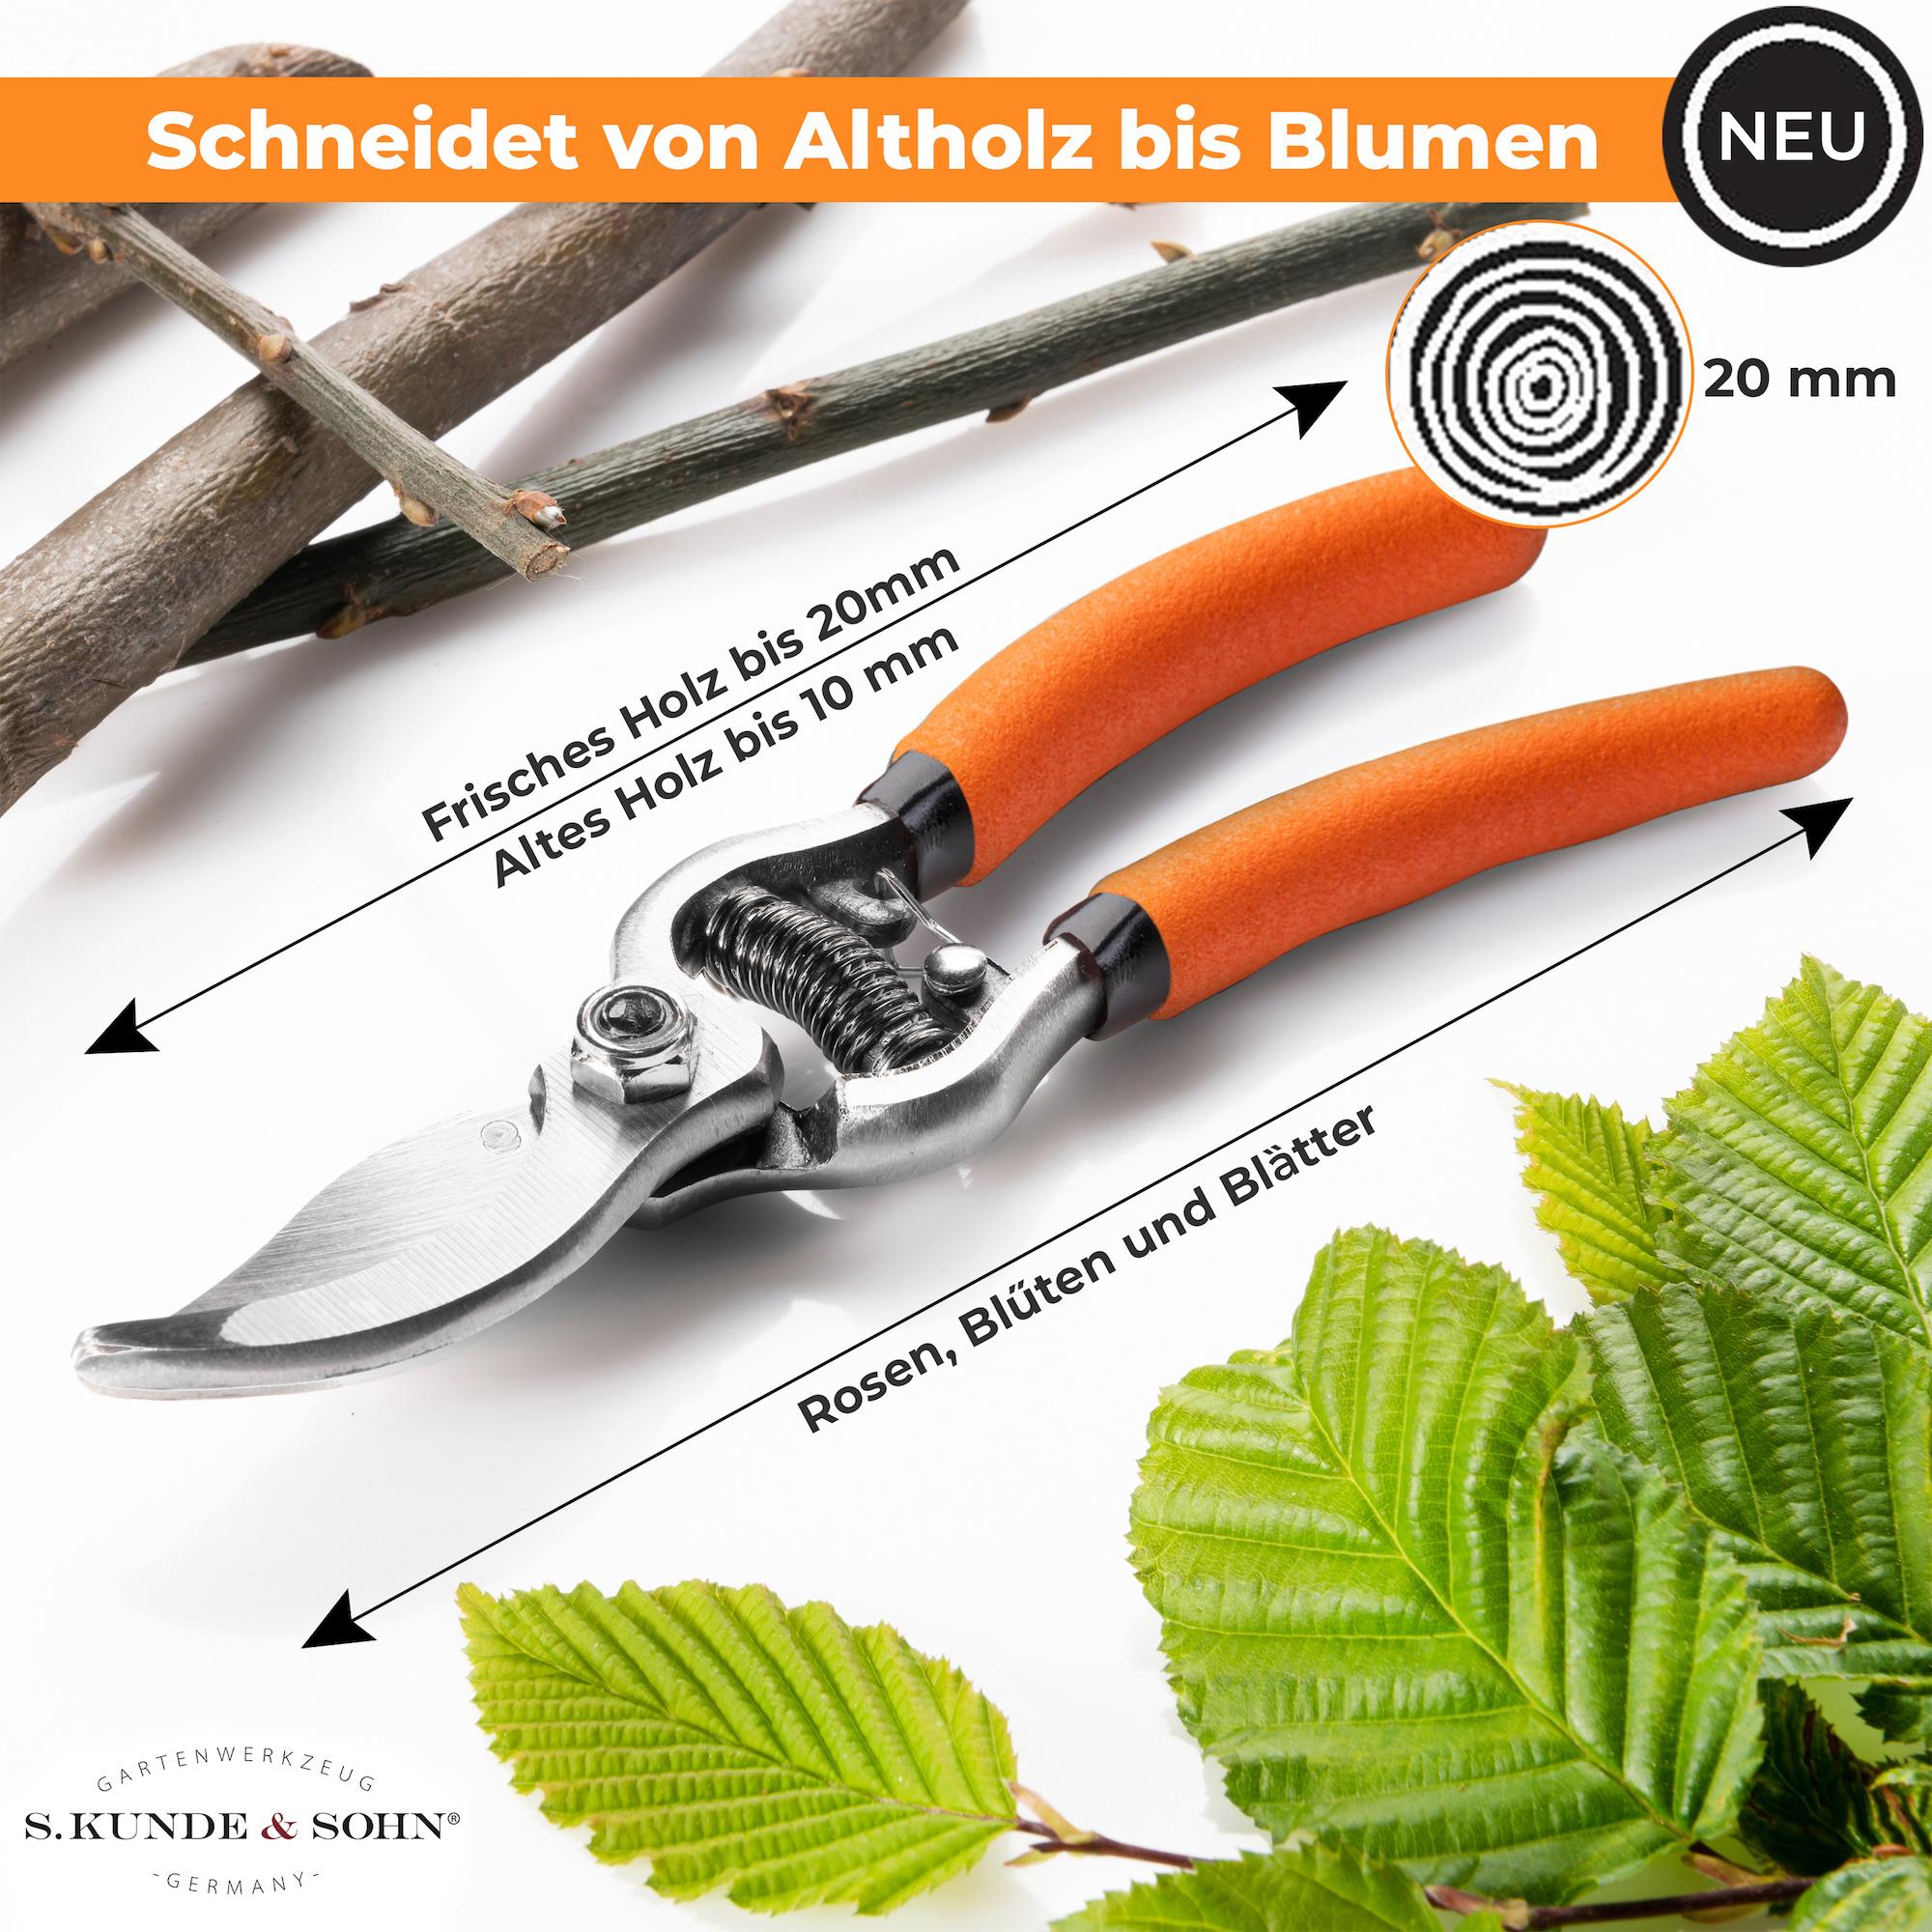 S. Kunde & Sohn Germany SKS 6 Tradition 17cm Schwarz/Klinge silber